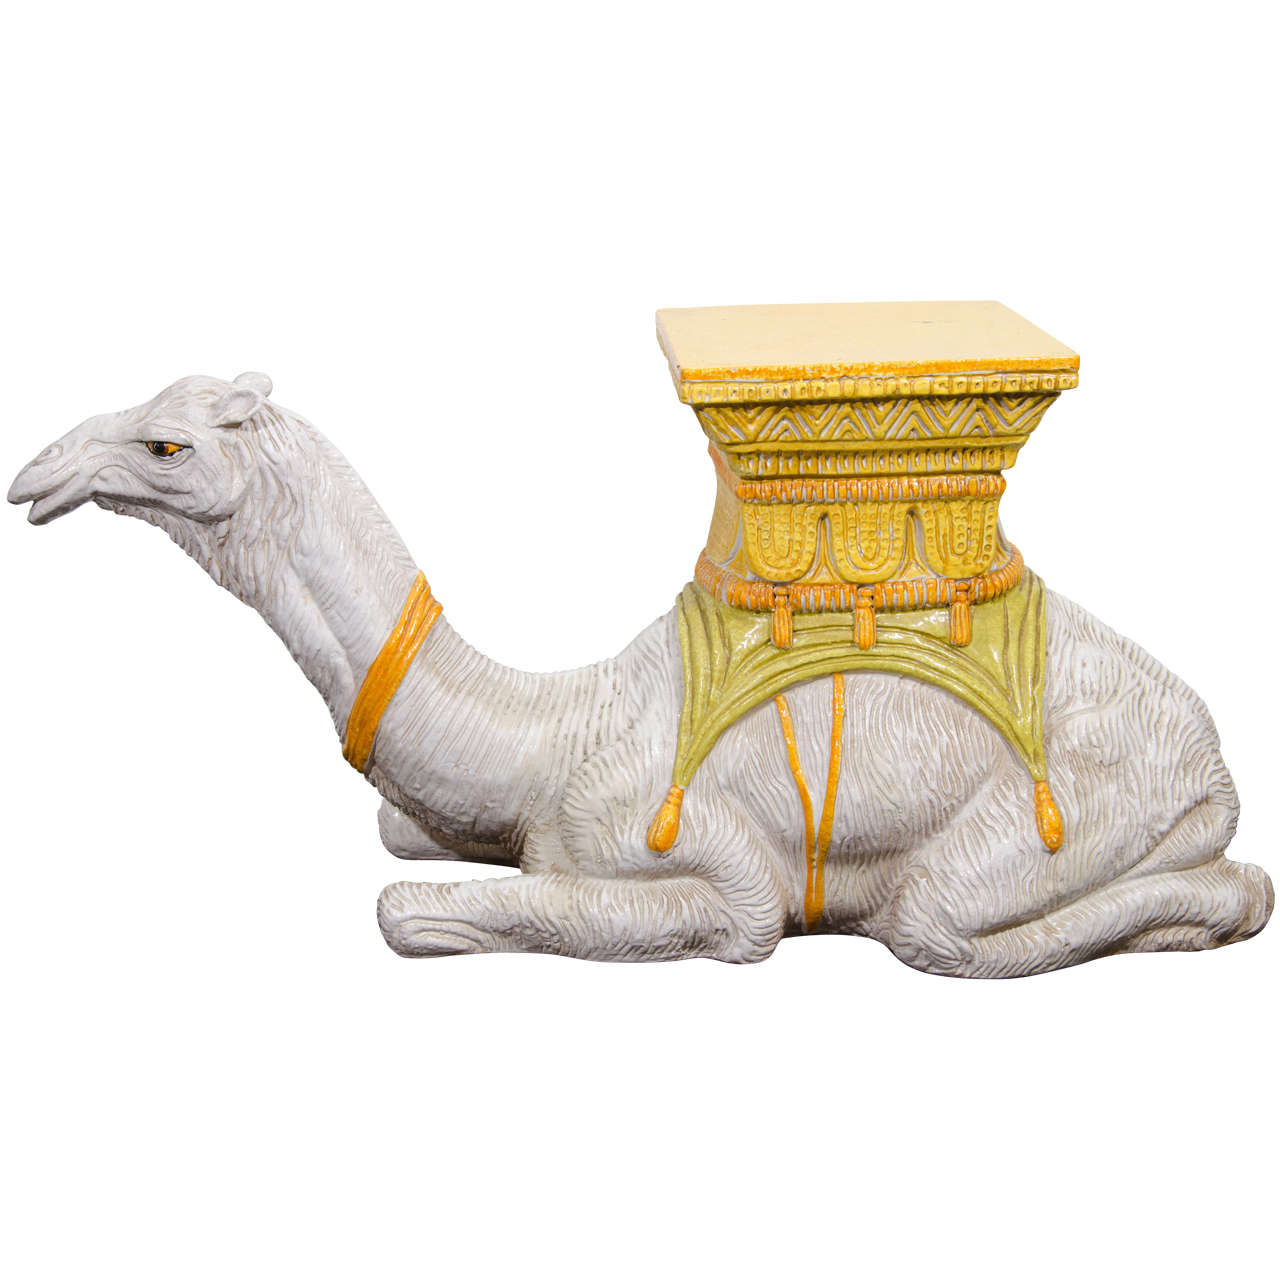 midcentury highly decorative italian ceramic camel form garden